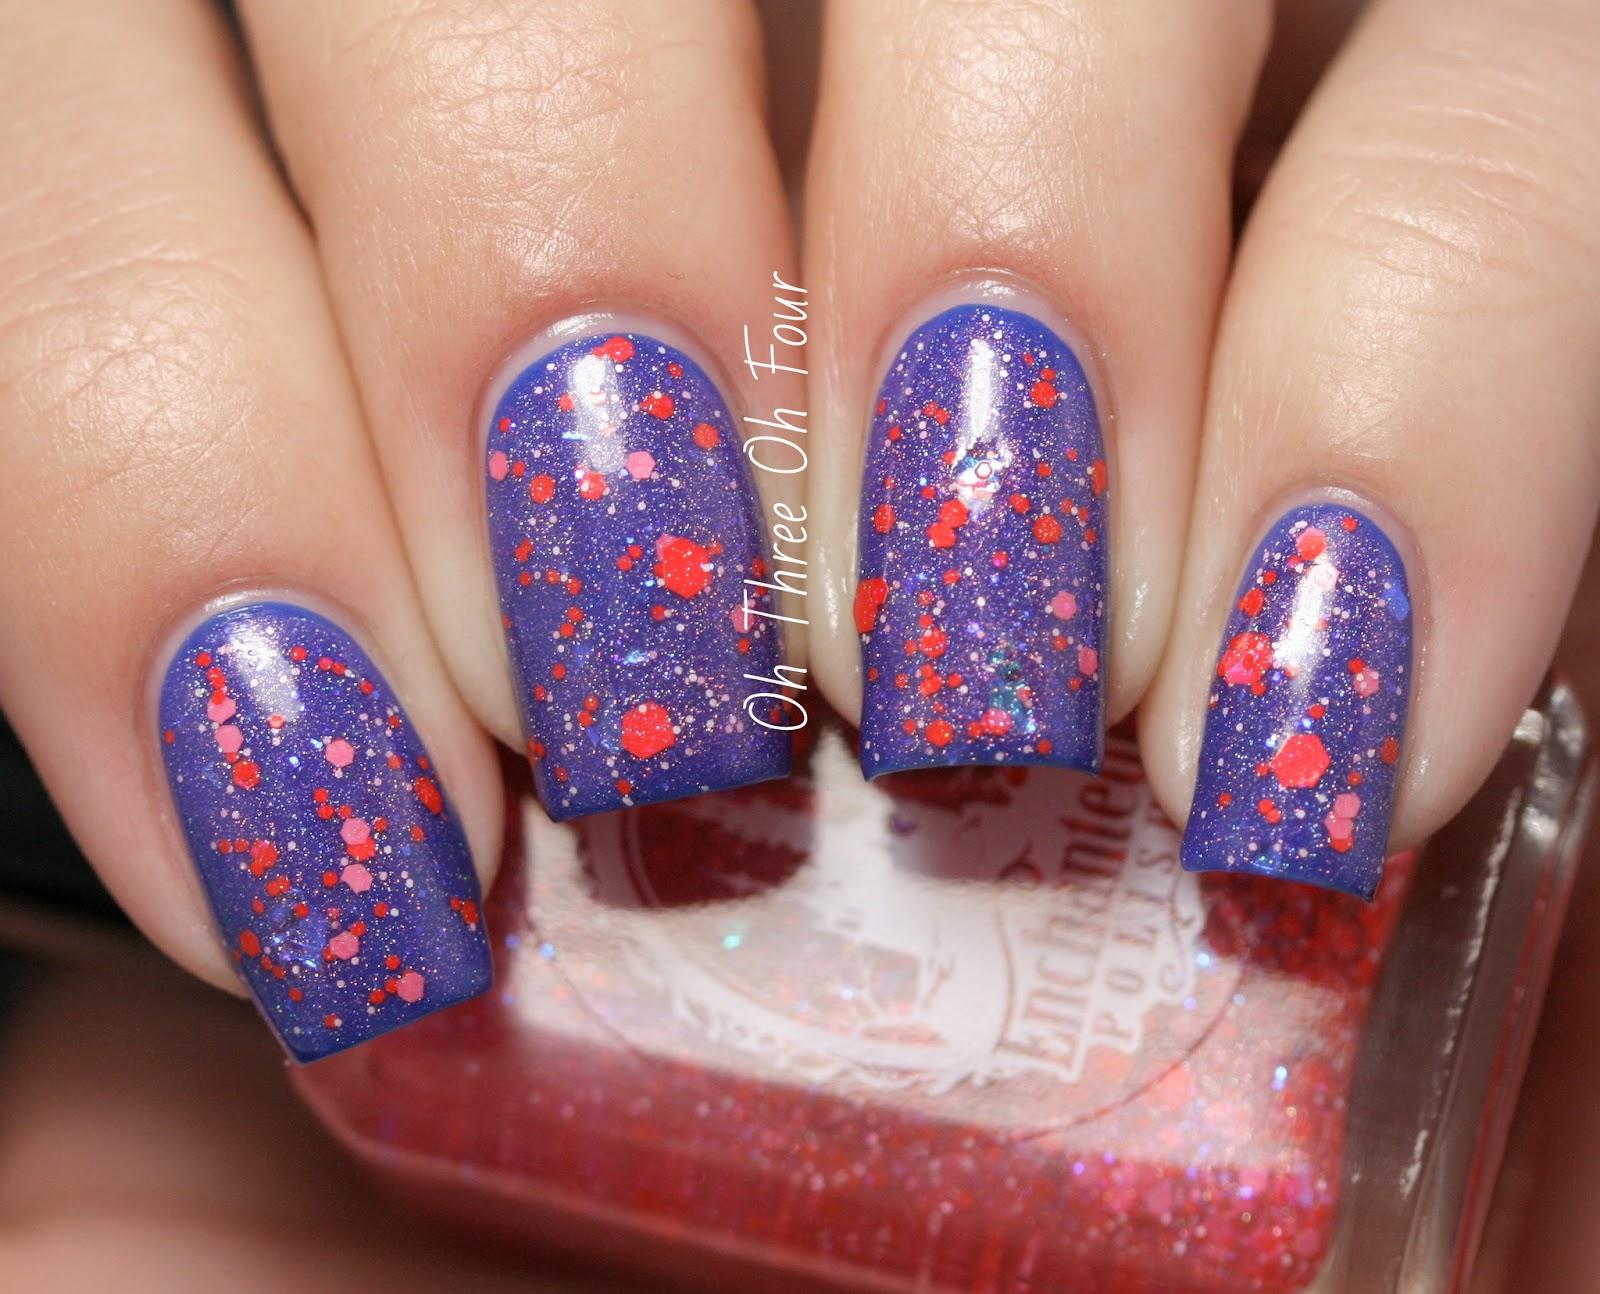 Enchanted Polish Flamingo Freckles Swatches